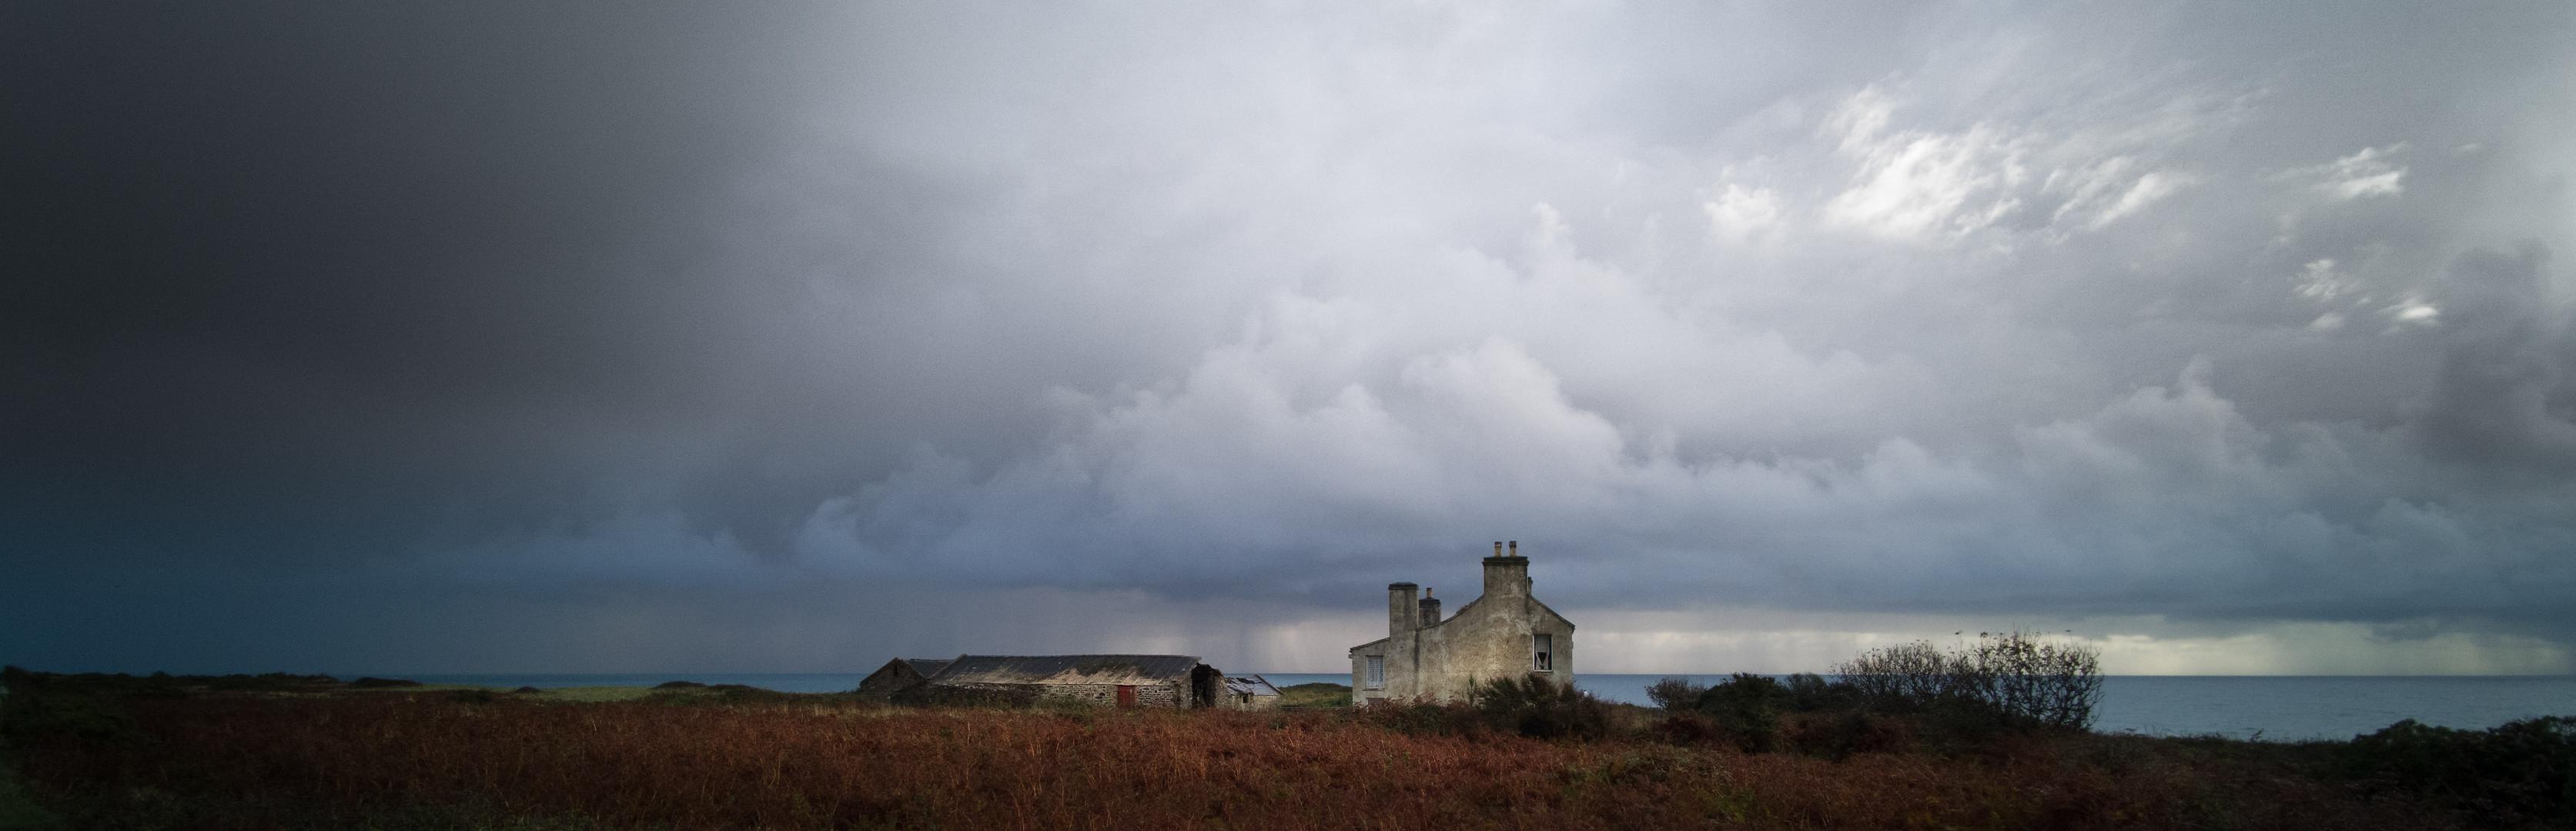 Isle of Man portfolio 2019 - Photographe